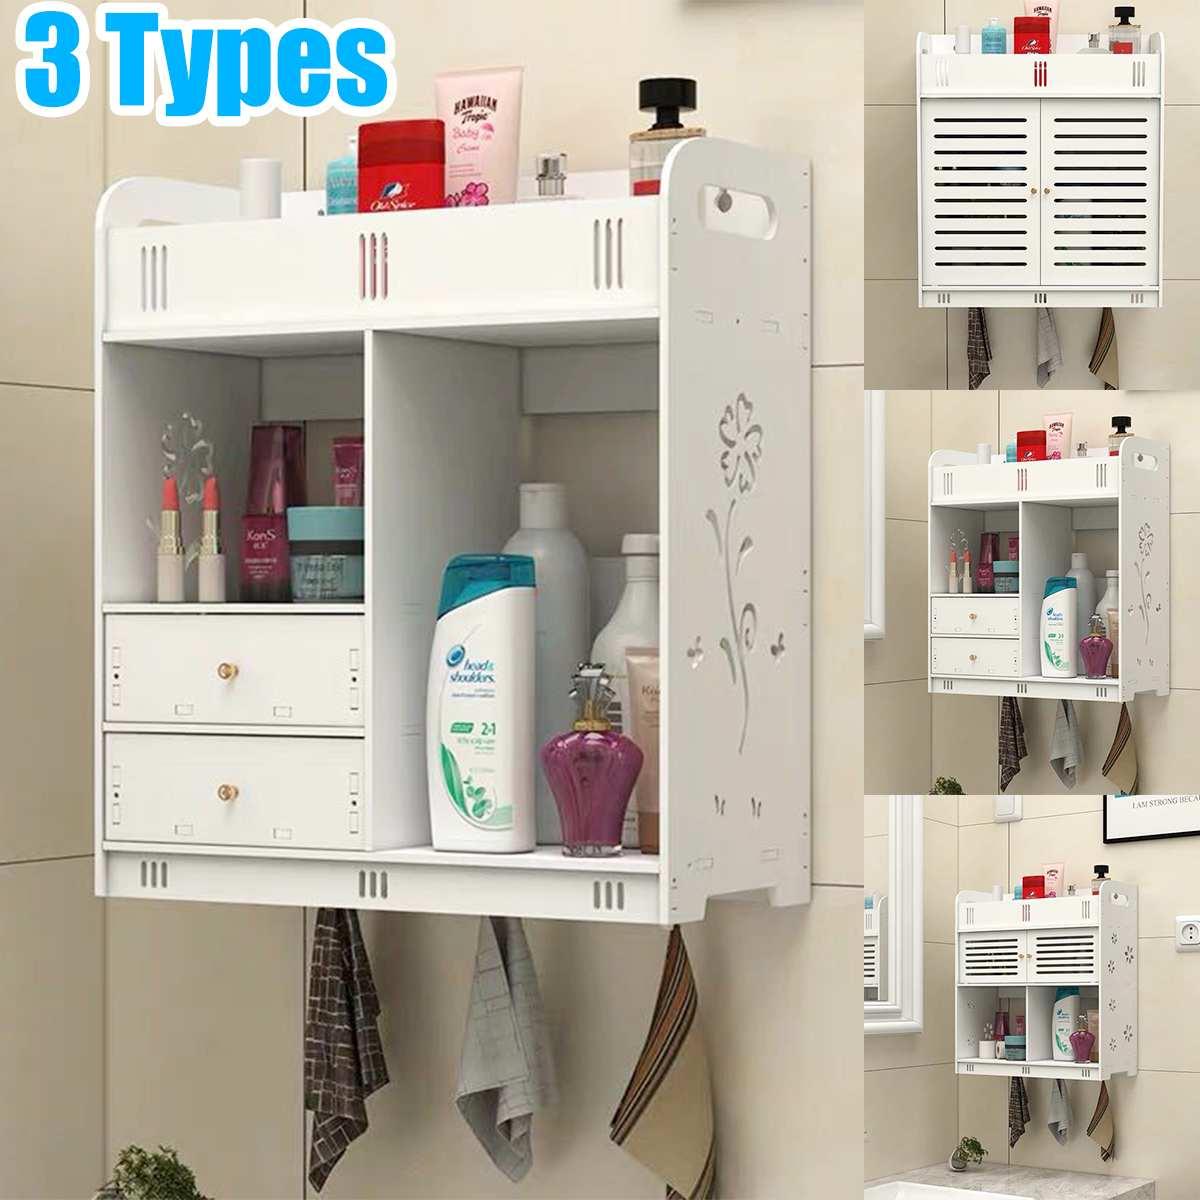 Bathroom Cabinet 38x18x43cm Wall Mounted Bathroom Toilet Furniture Cabinet Wood-Plastic Cupboard Shelf Cosmetic Storage Rack